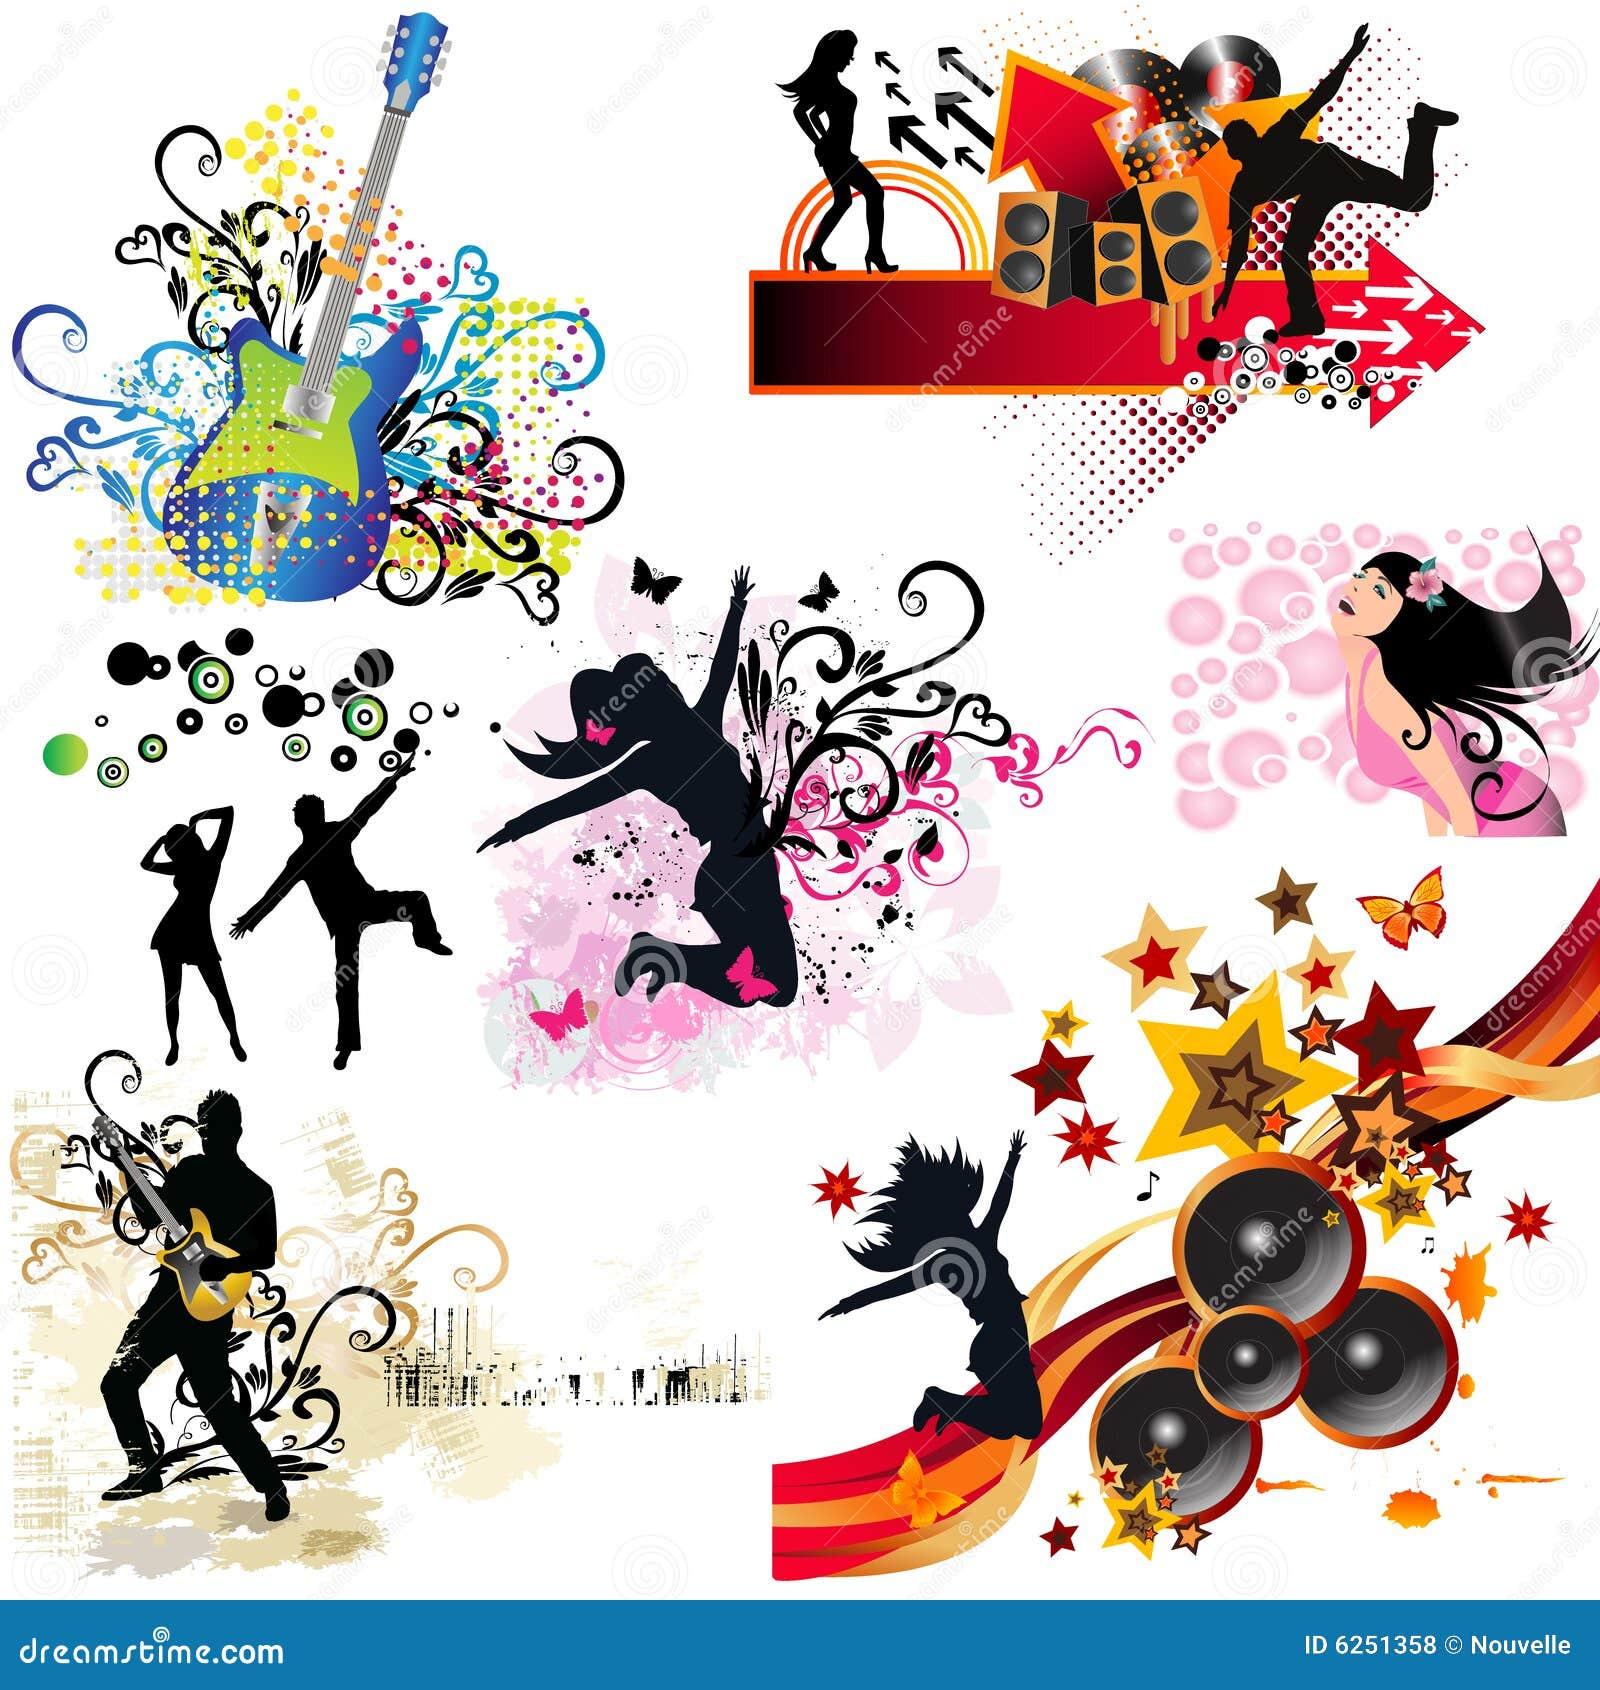 Music Design Elements Royalty Free Stock Photos Image